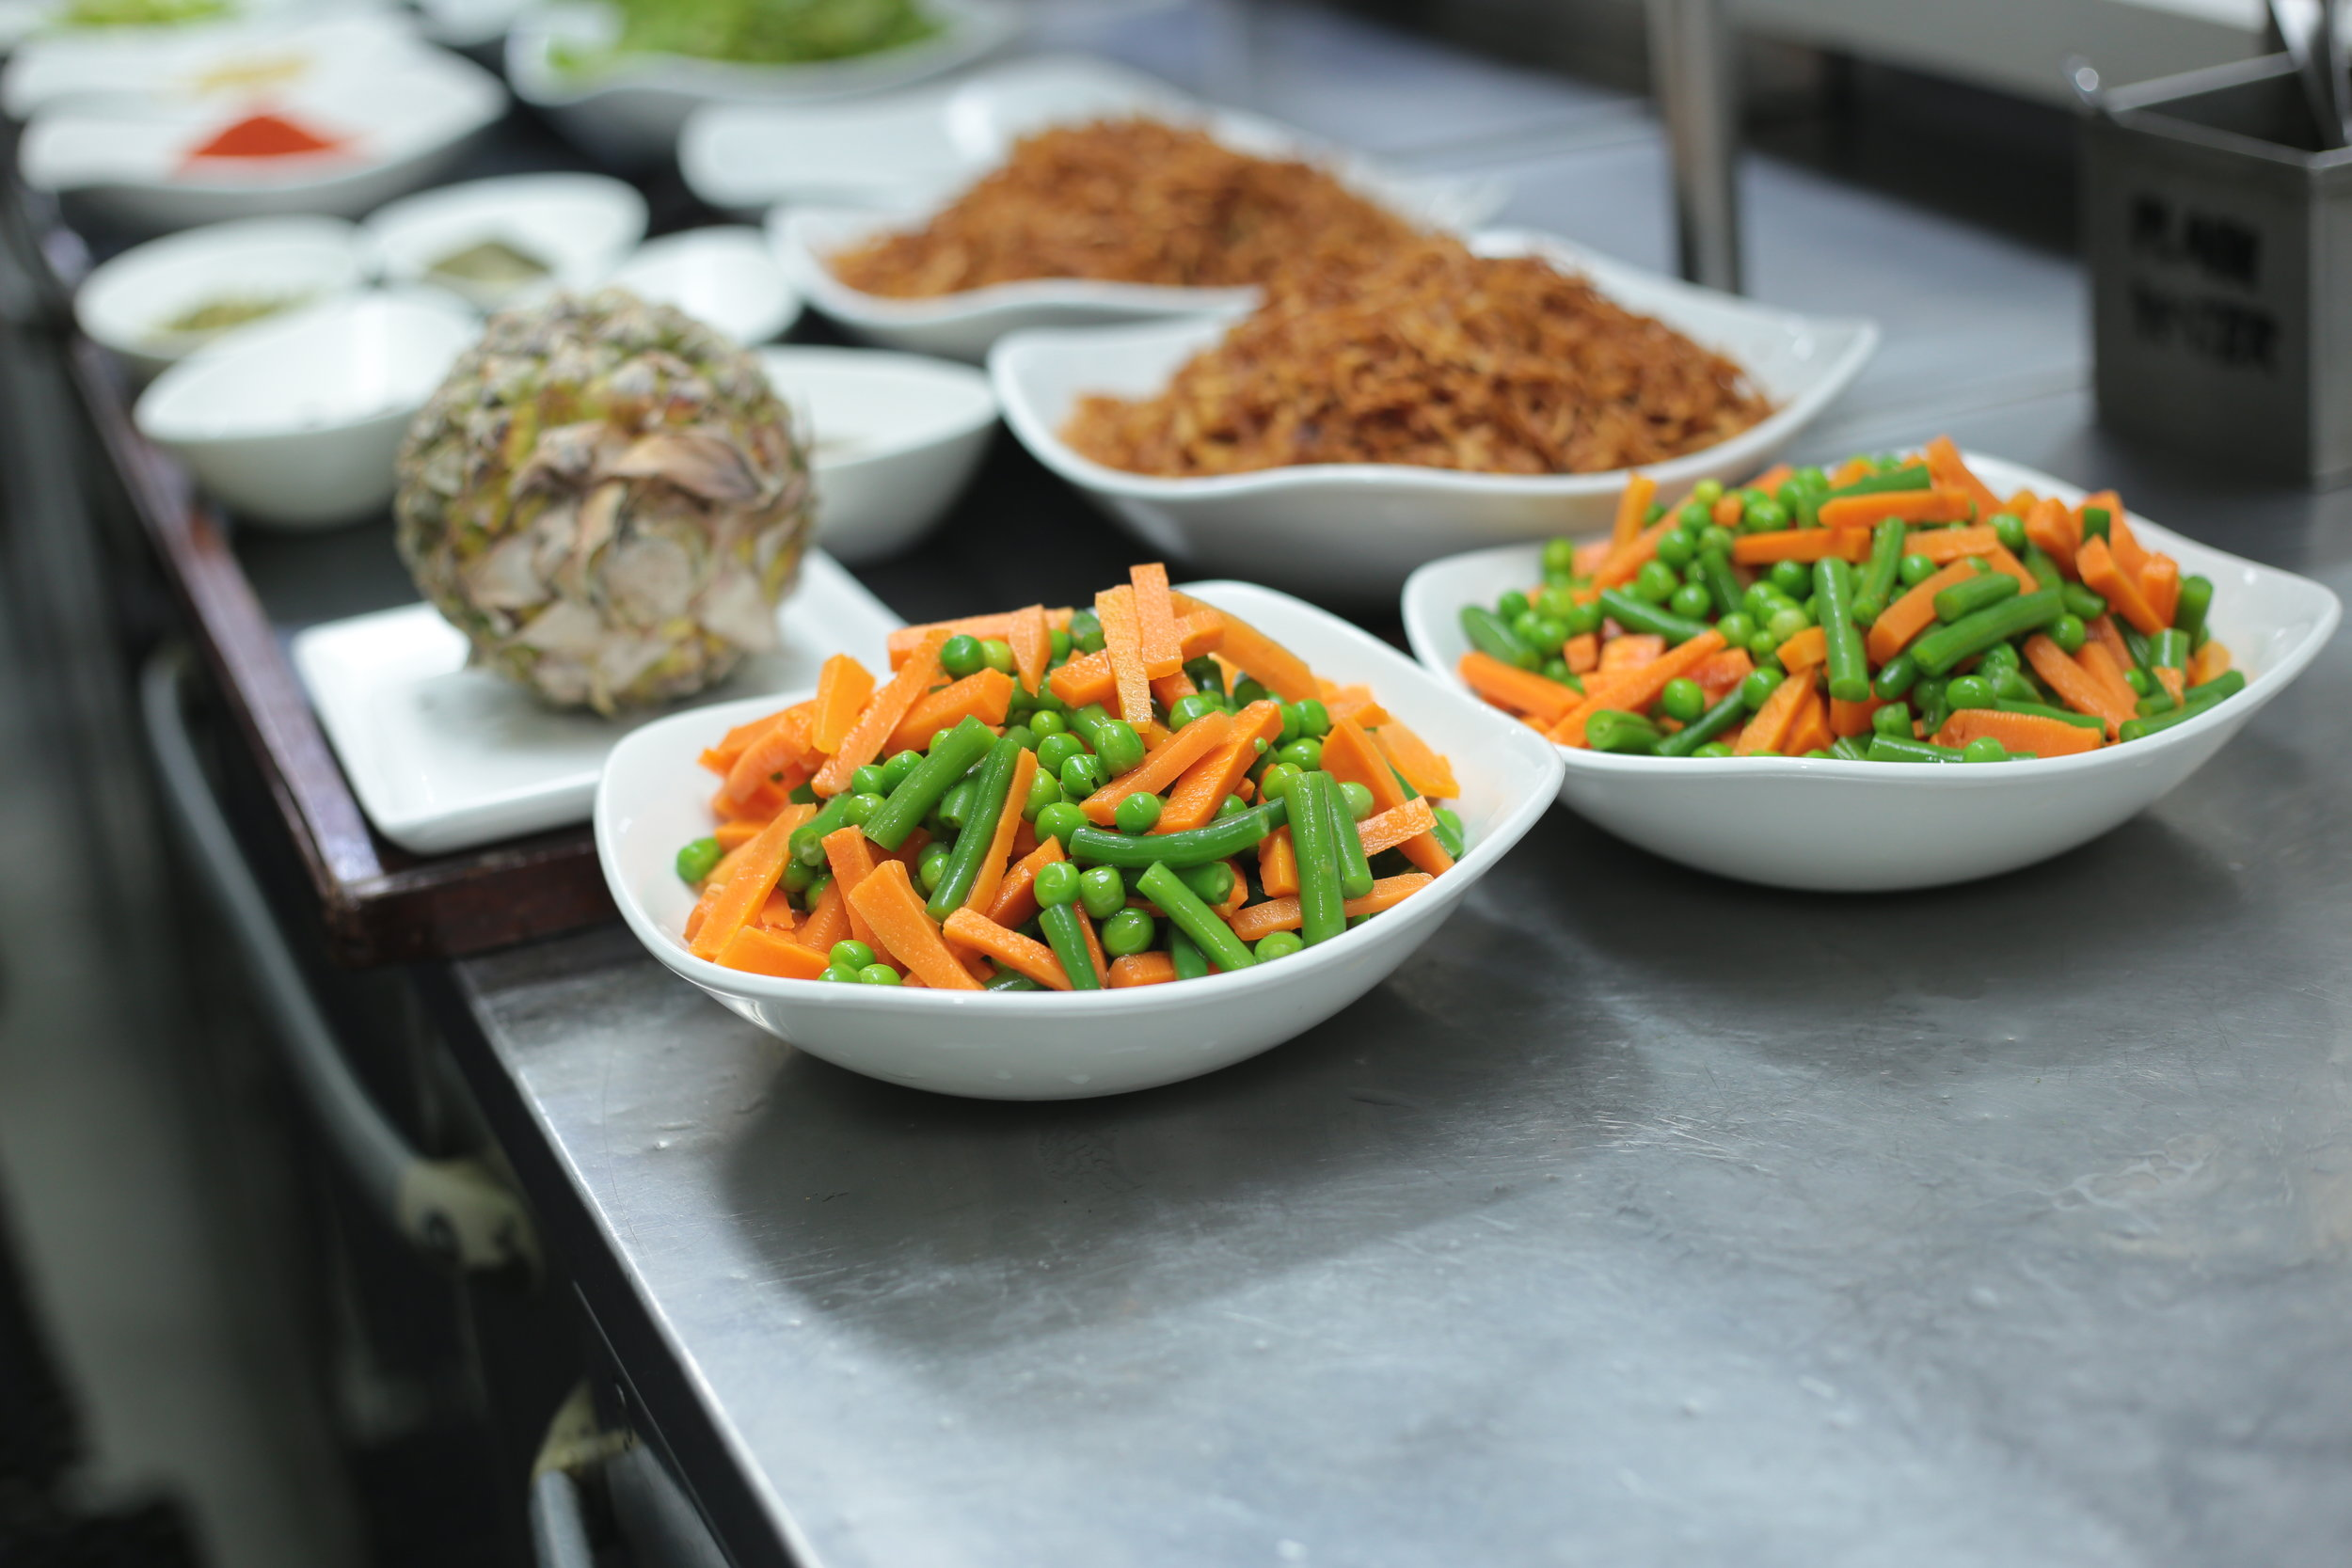 Vegetables for the biryani